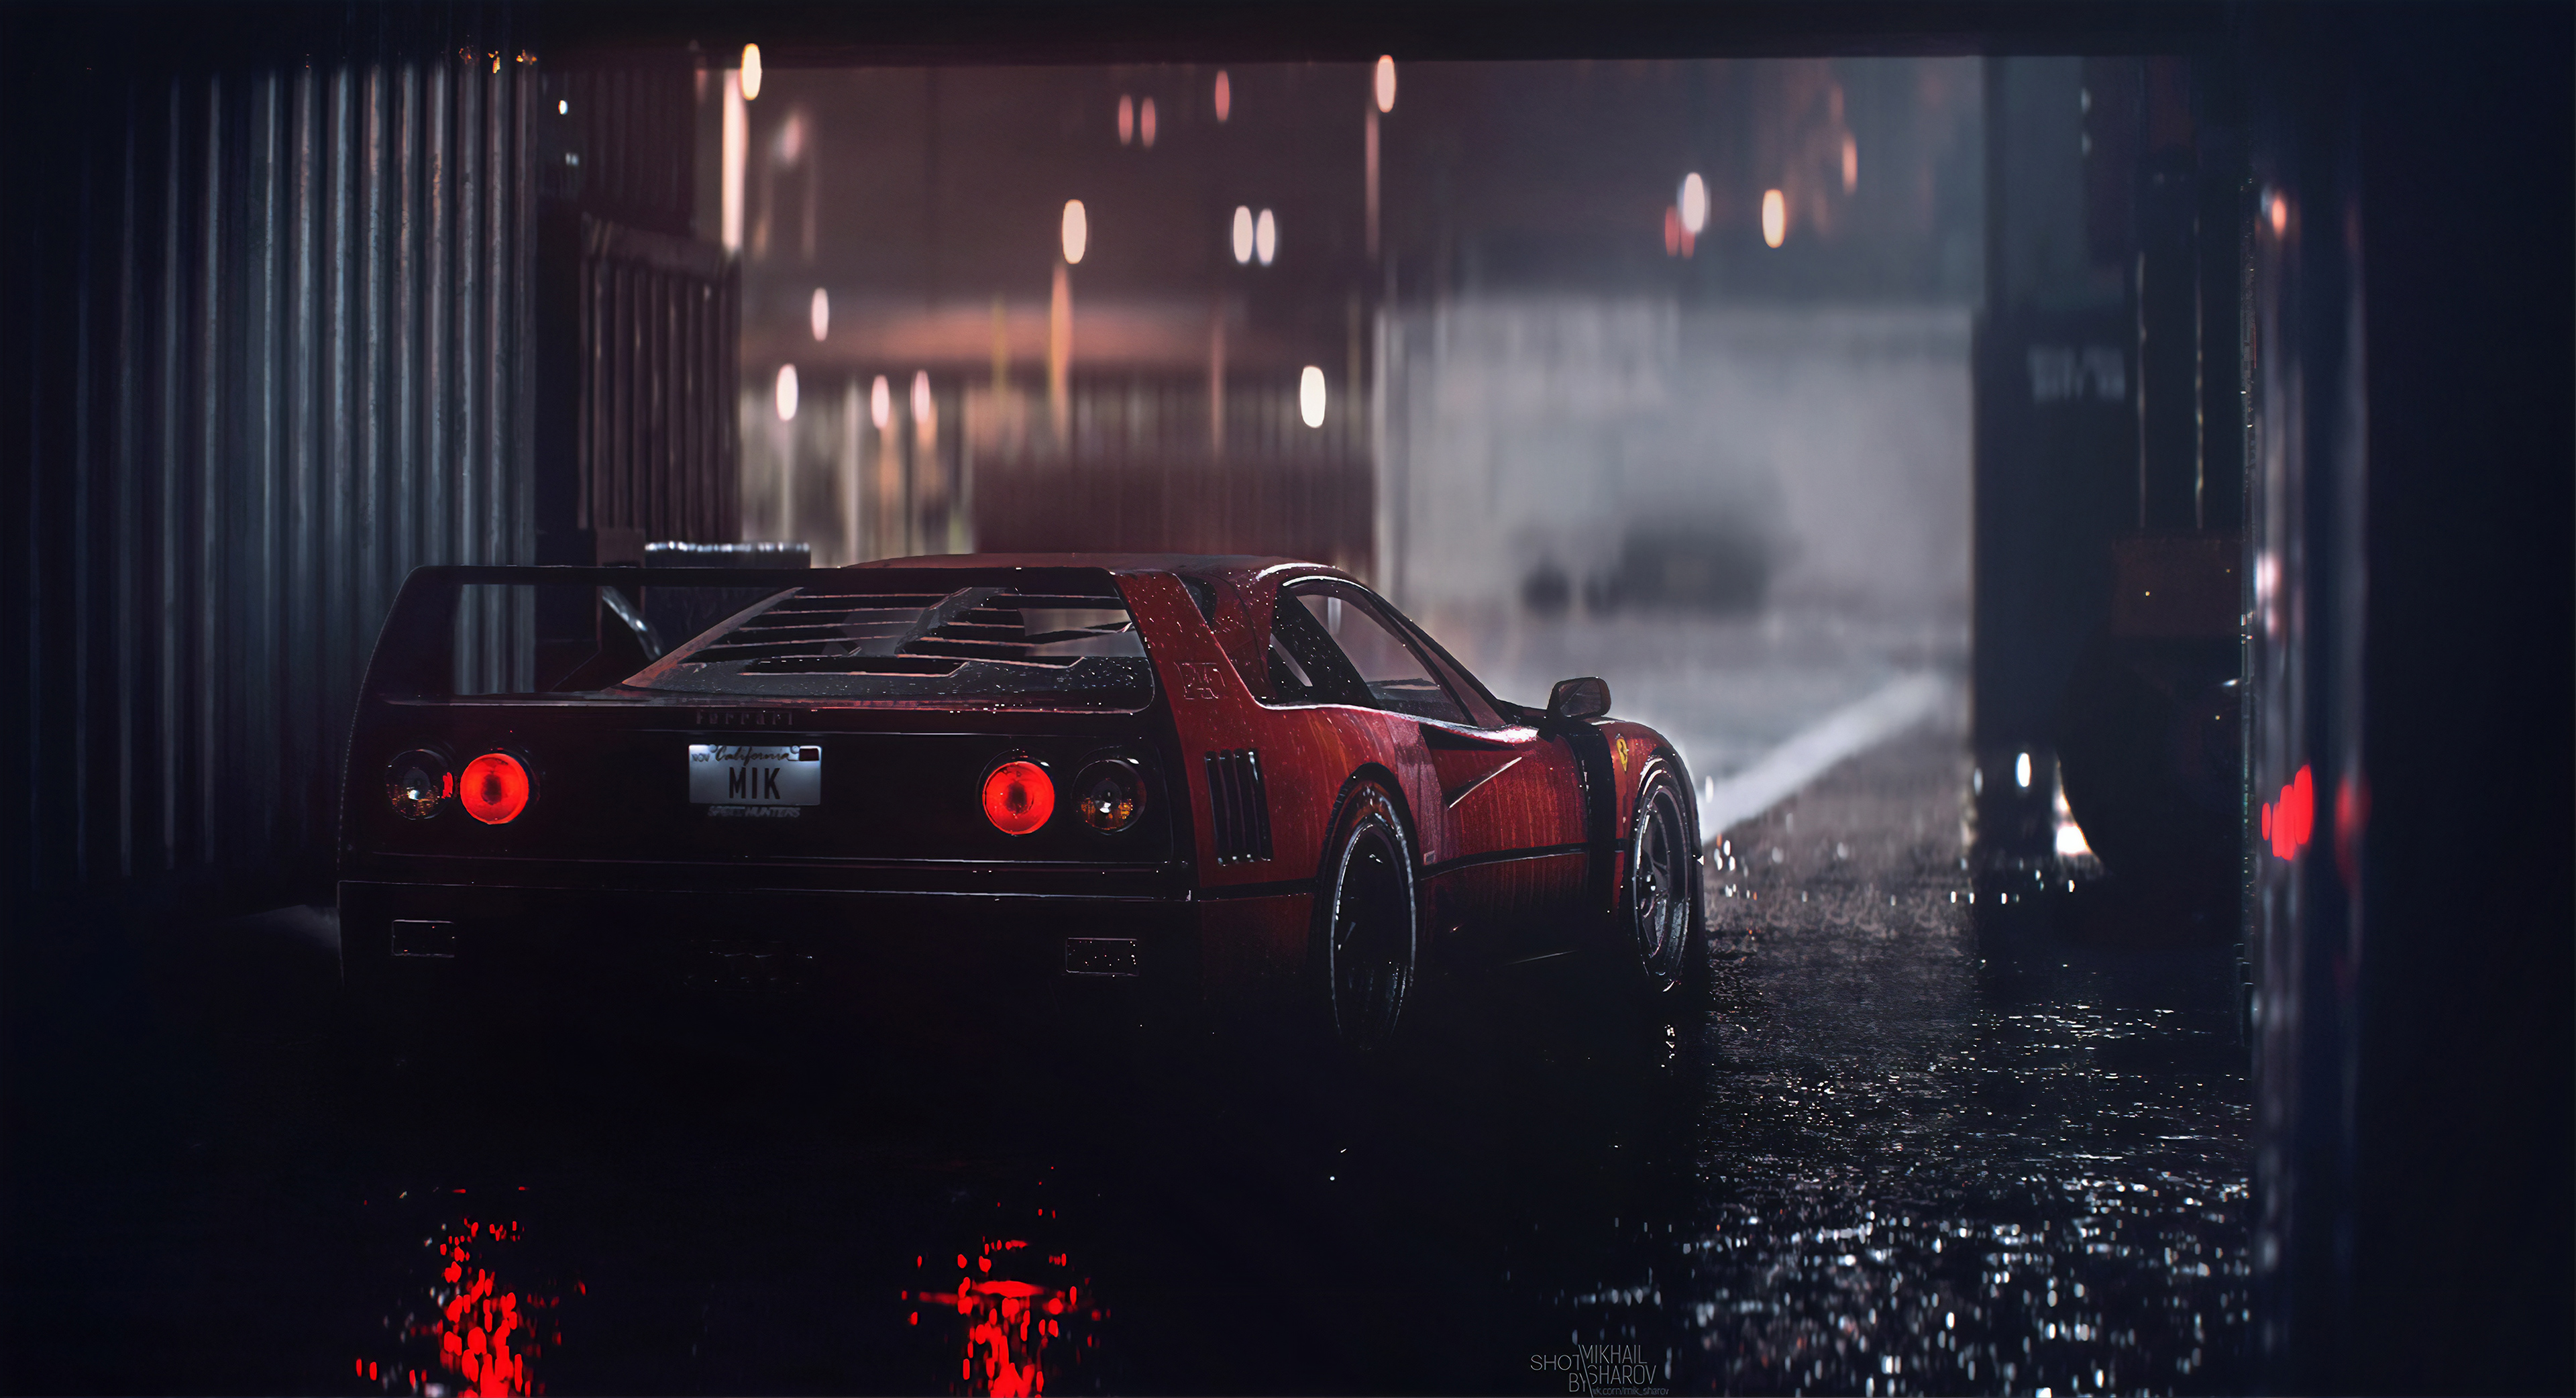 Ferrari F40 Rain 4k, HD Games, 4k Wallpapers, Images